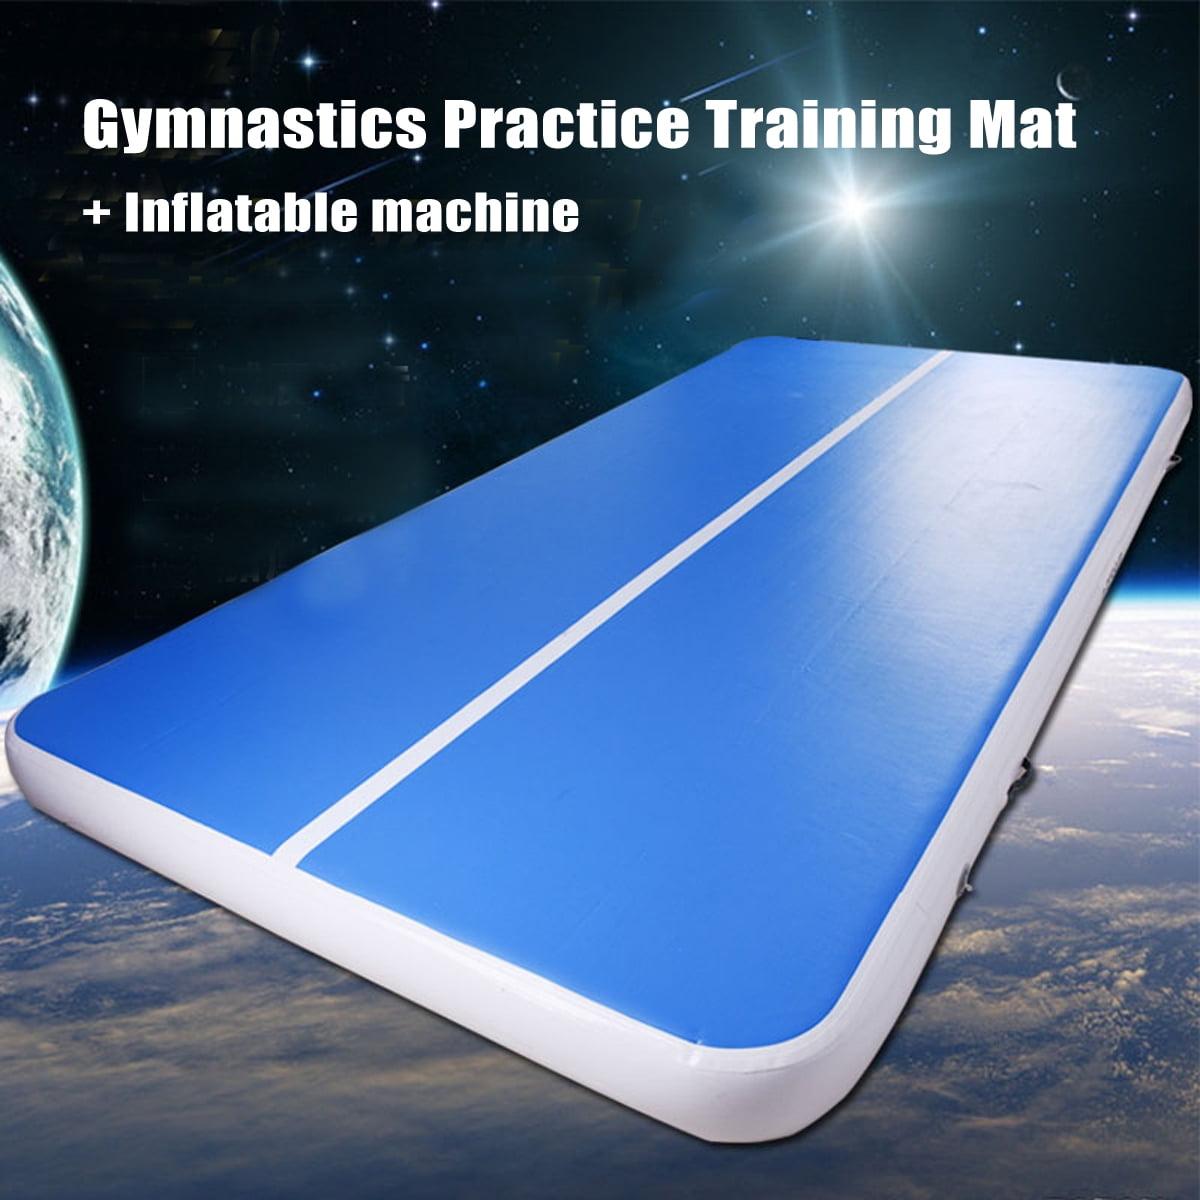 Inflatable Gymnastics Cheerleading Tumbling Yoga Mat Air Track Floor Practice Training Mats Home Use